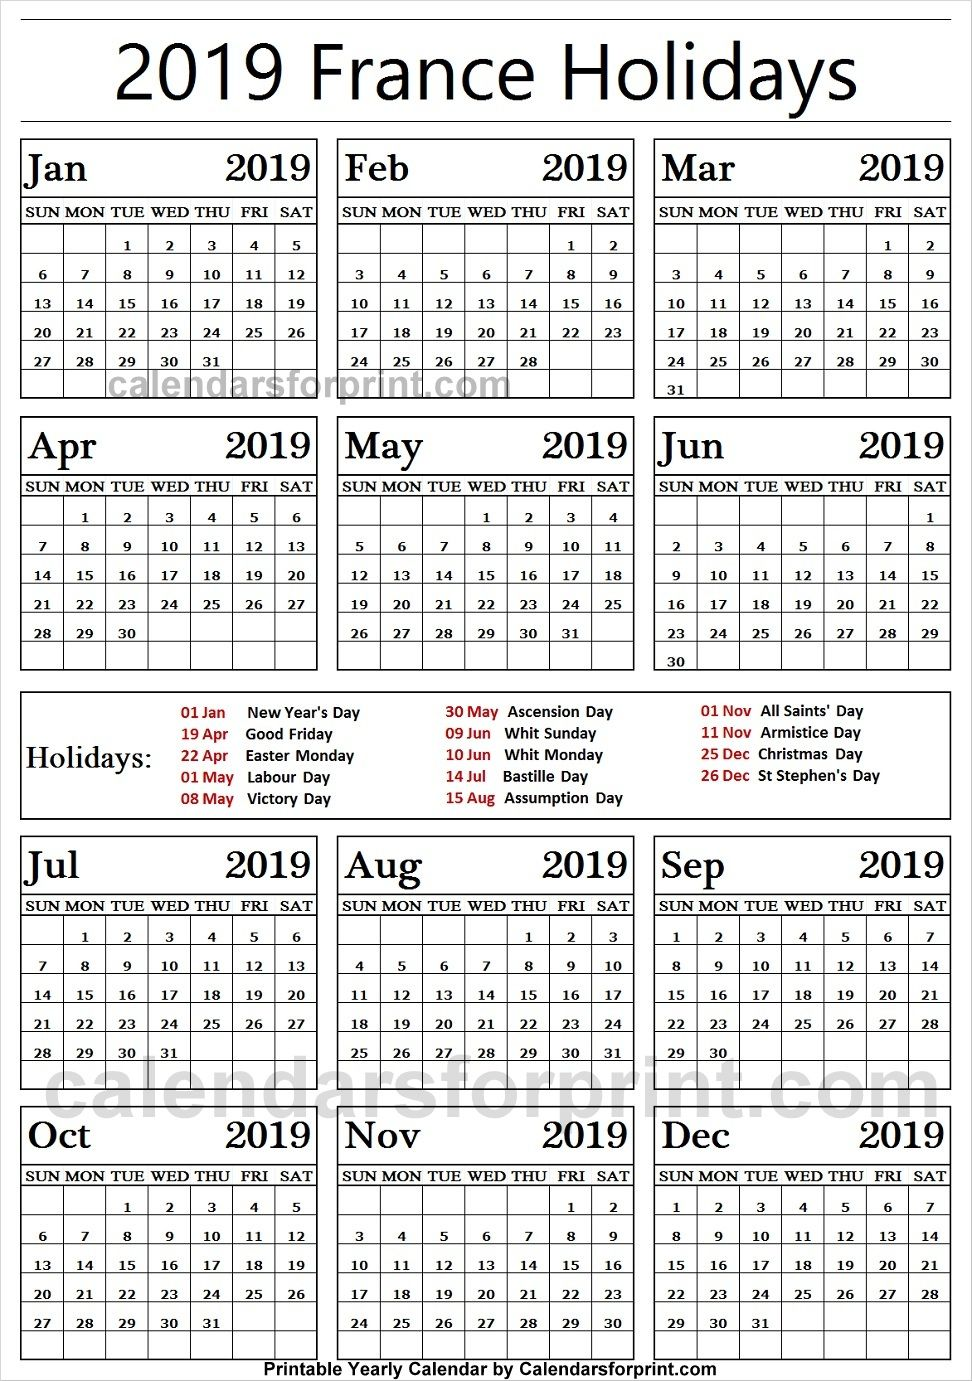 2019 Public Holidays France With Images Holidays France